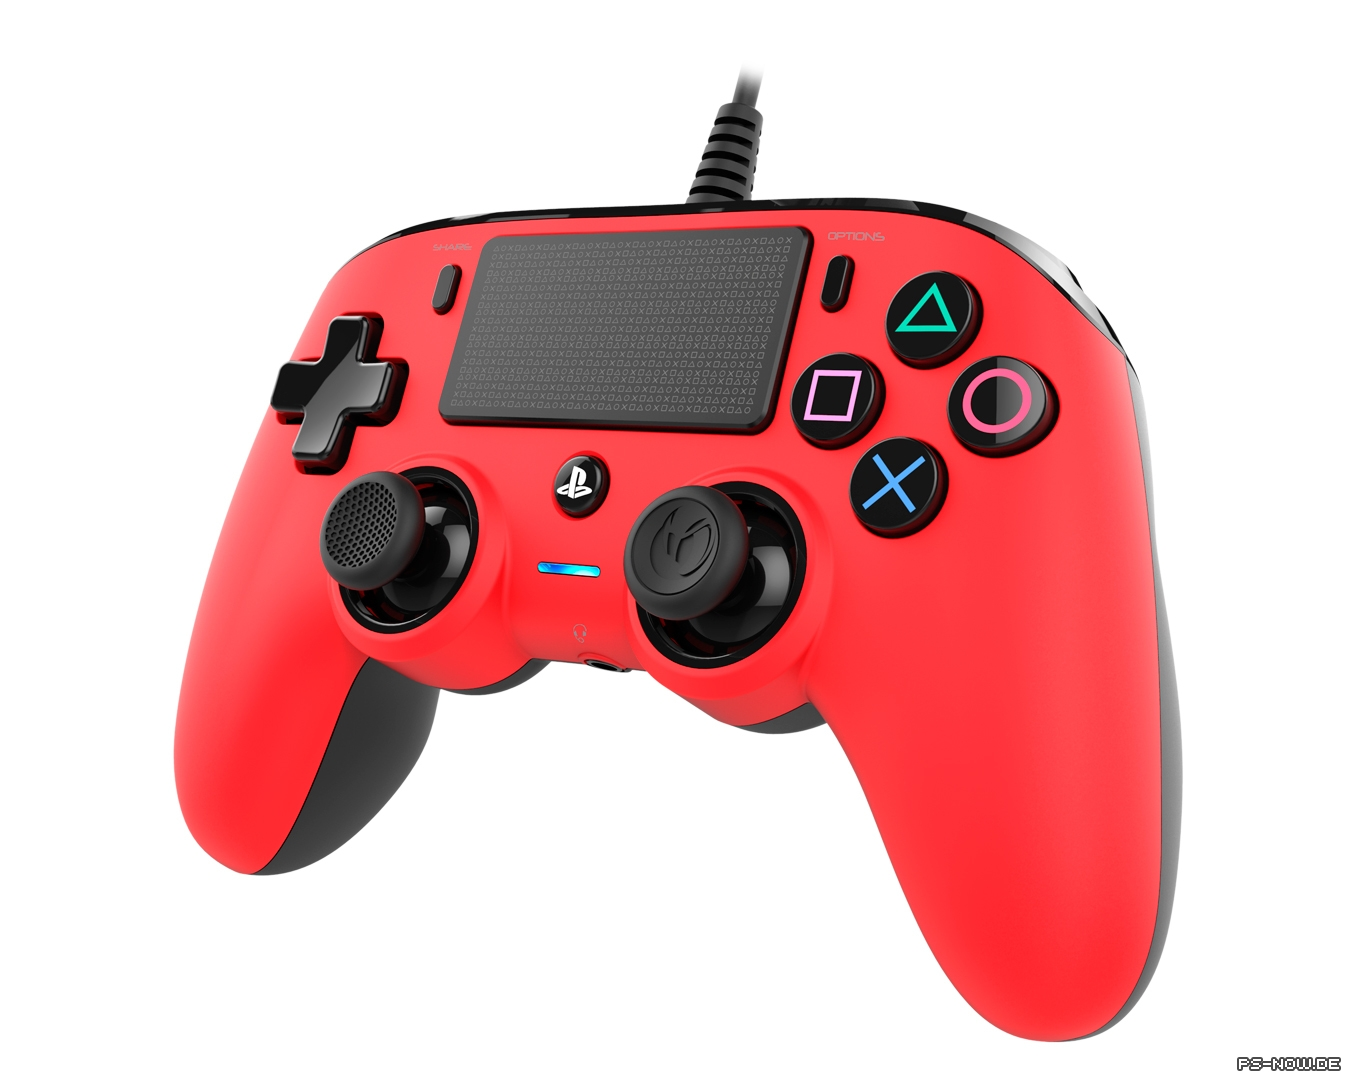 Nacon kündigt kabelgebundenen Controller für PS4 an - PS-NOW.de